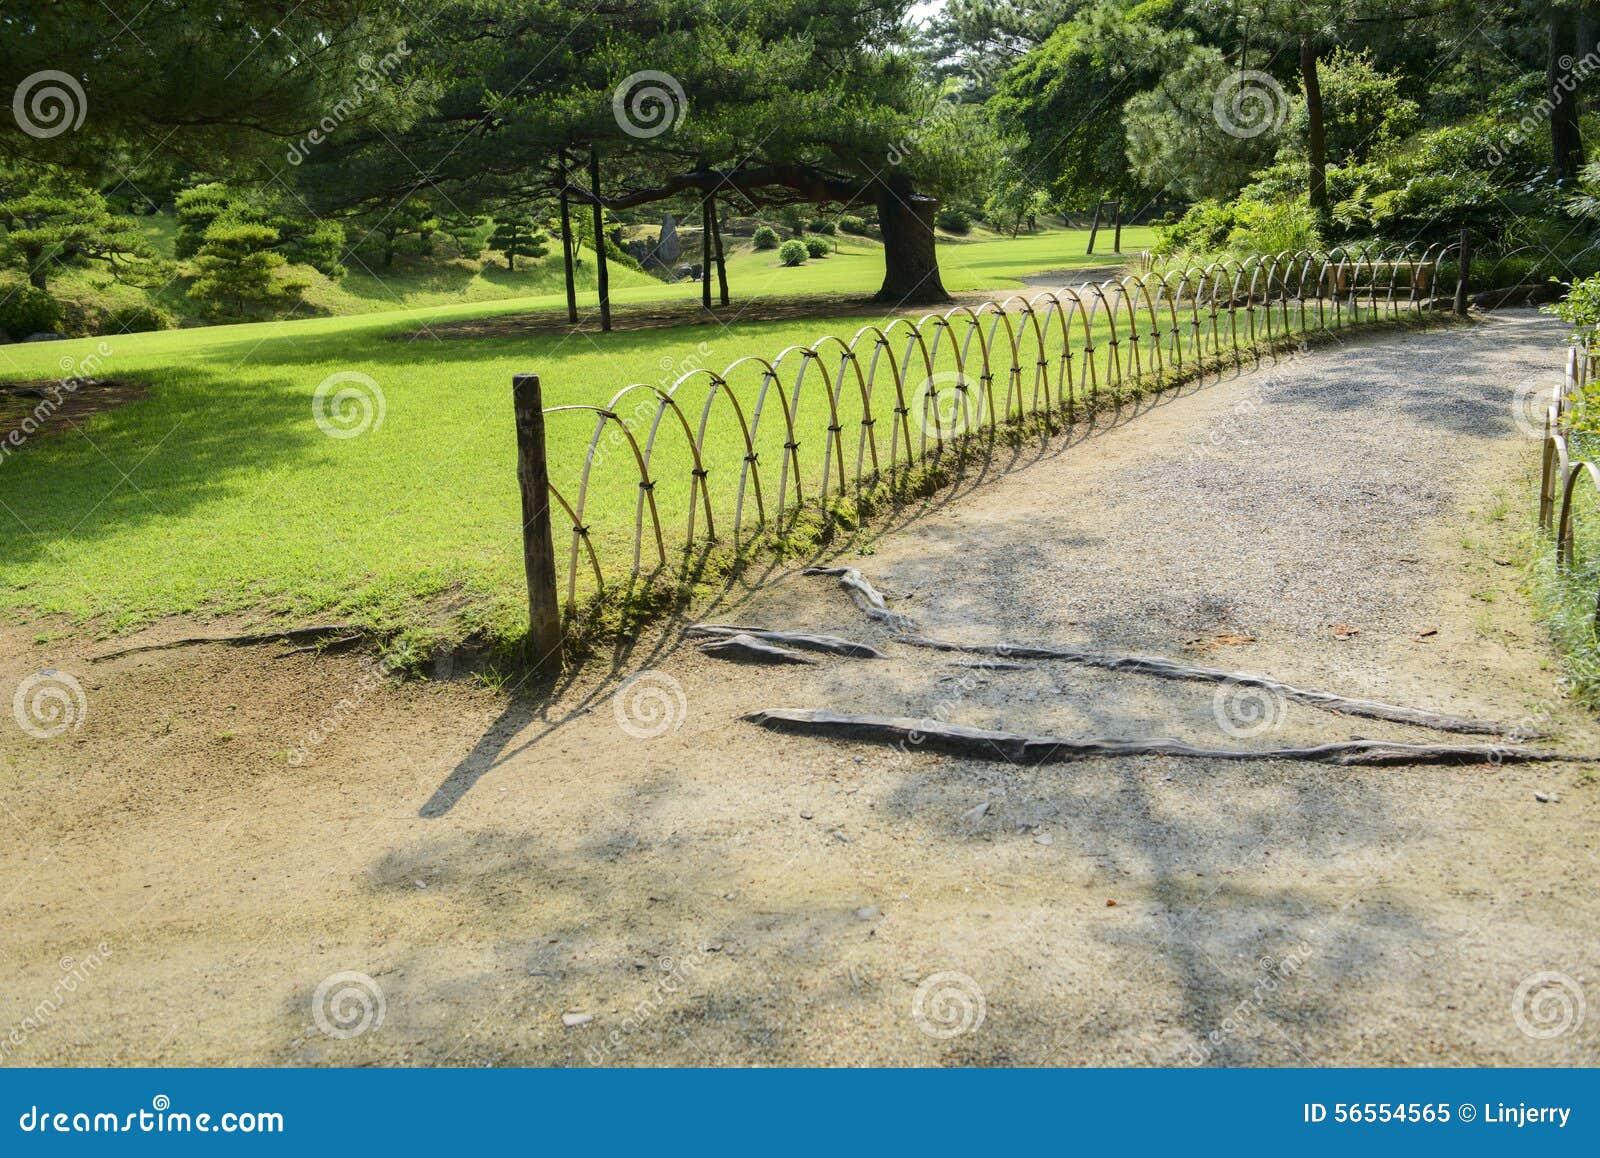 Download Ιαπωνικός κήπος με τα δέντρα Στοκ Εικόνα - εικόνα από ισορροπία, έξω: 56554565